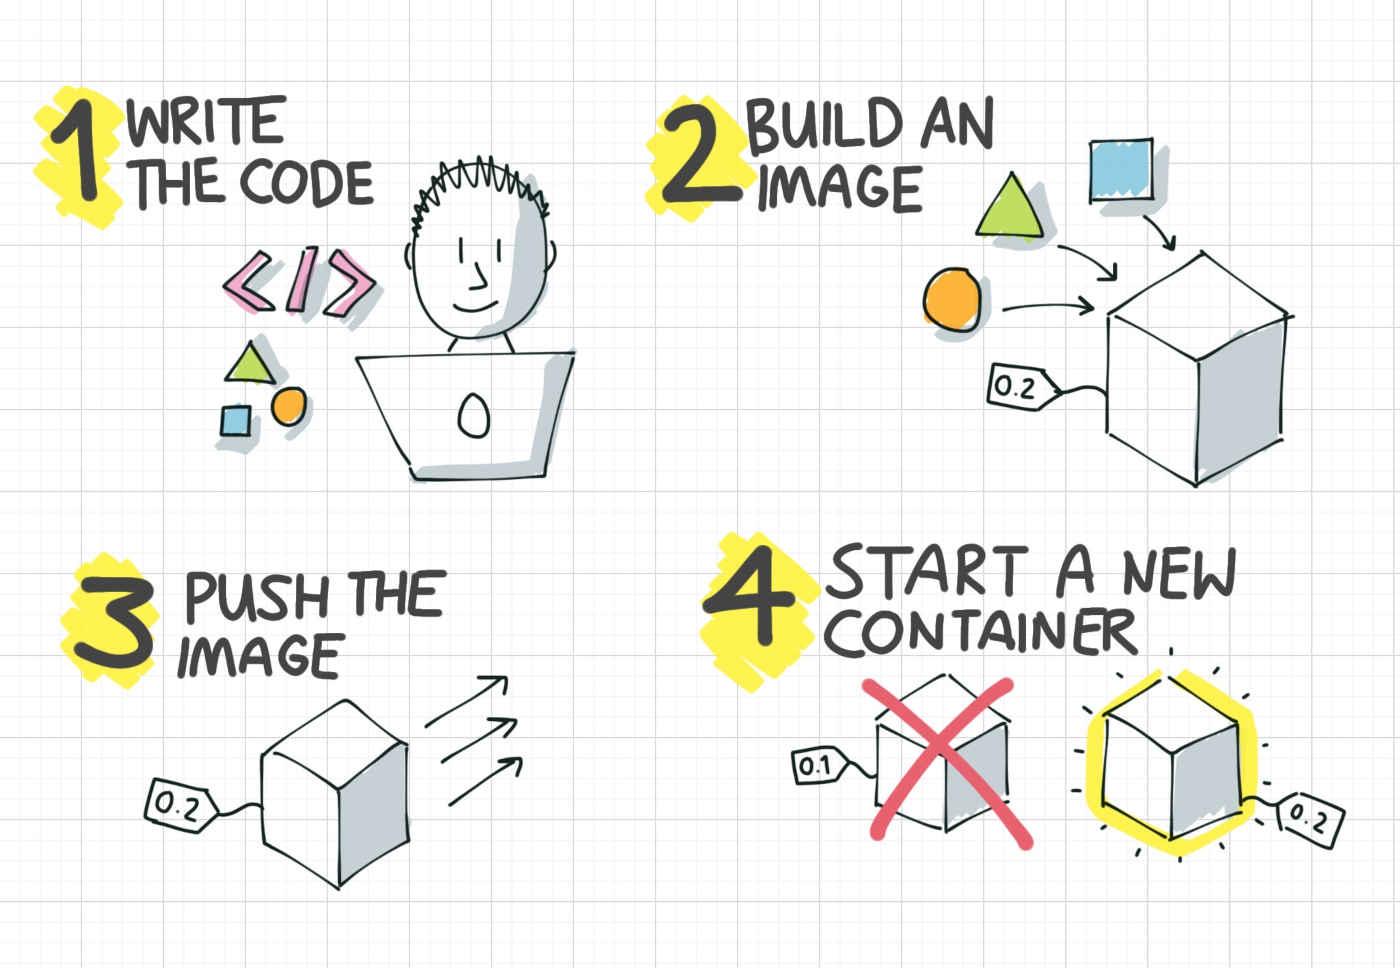 Container development: Code, Build, Push, Run